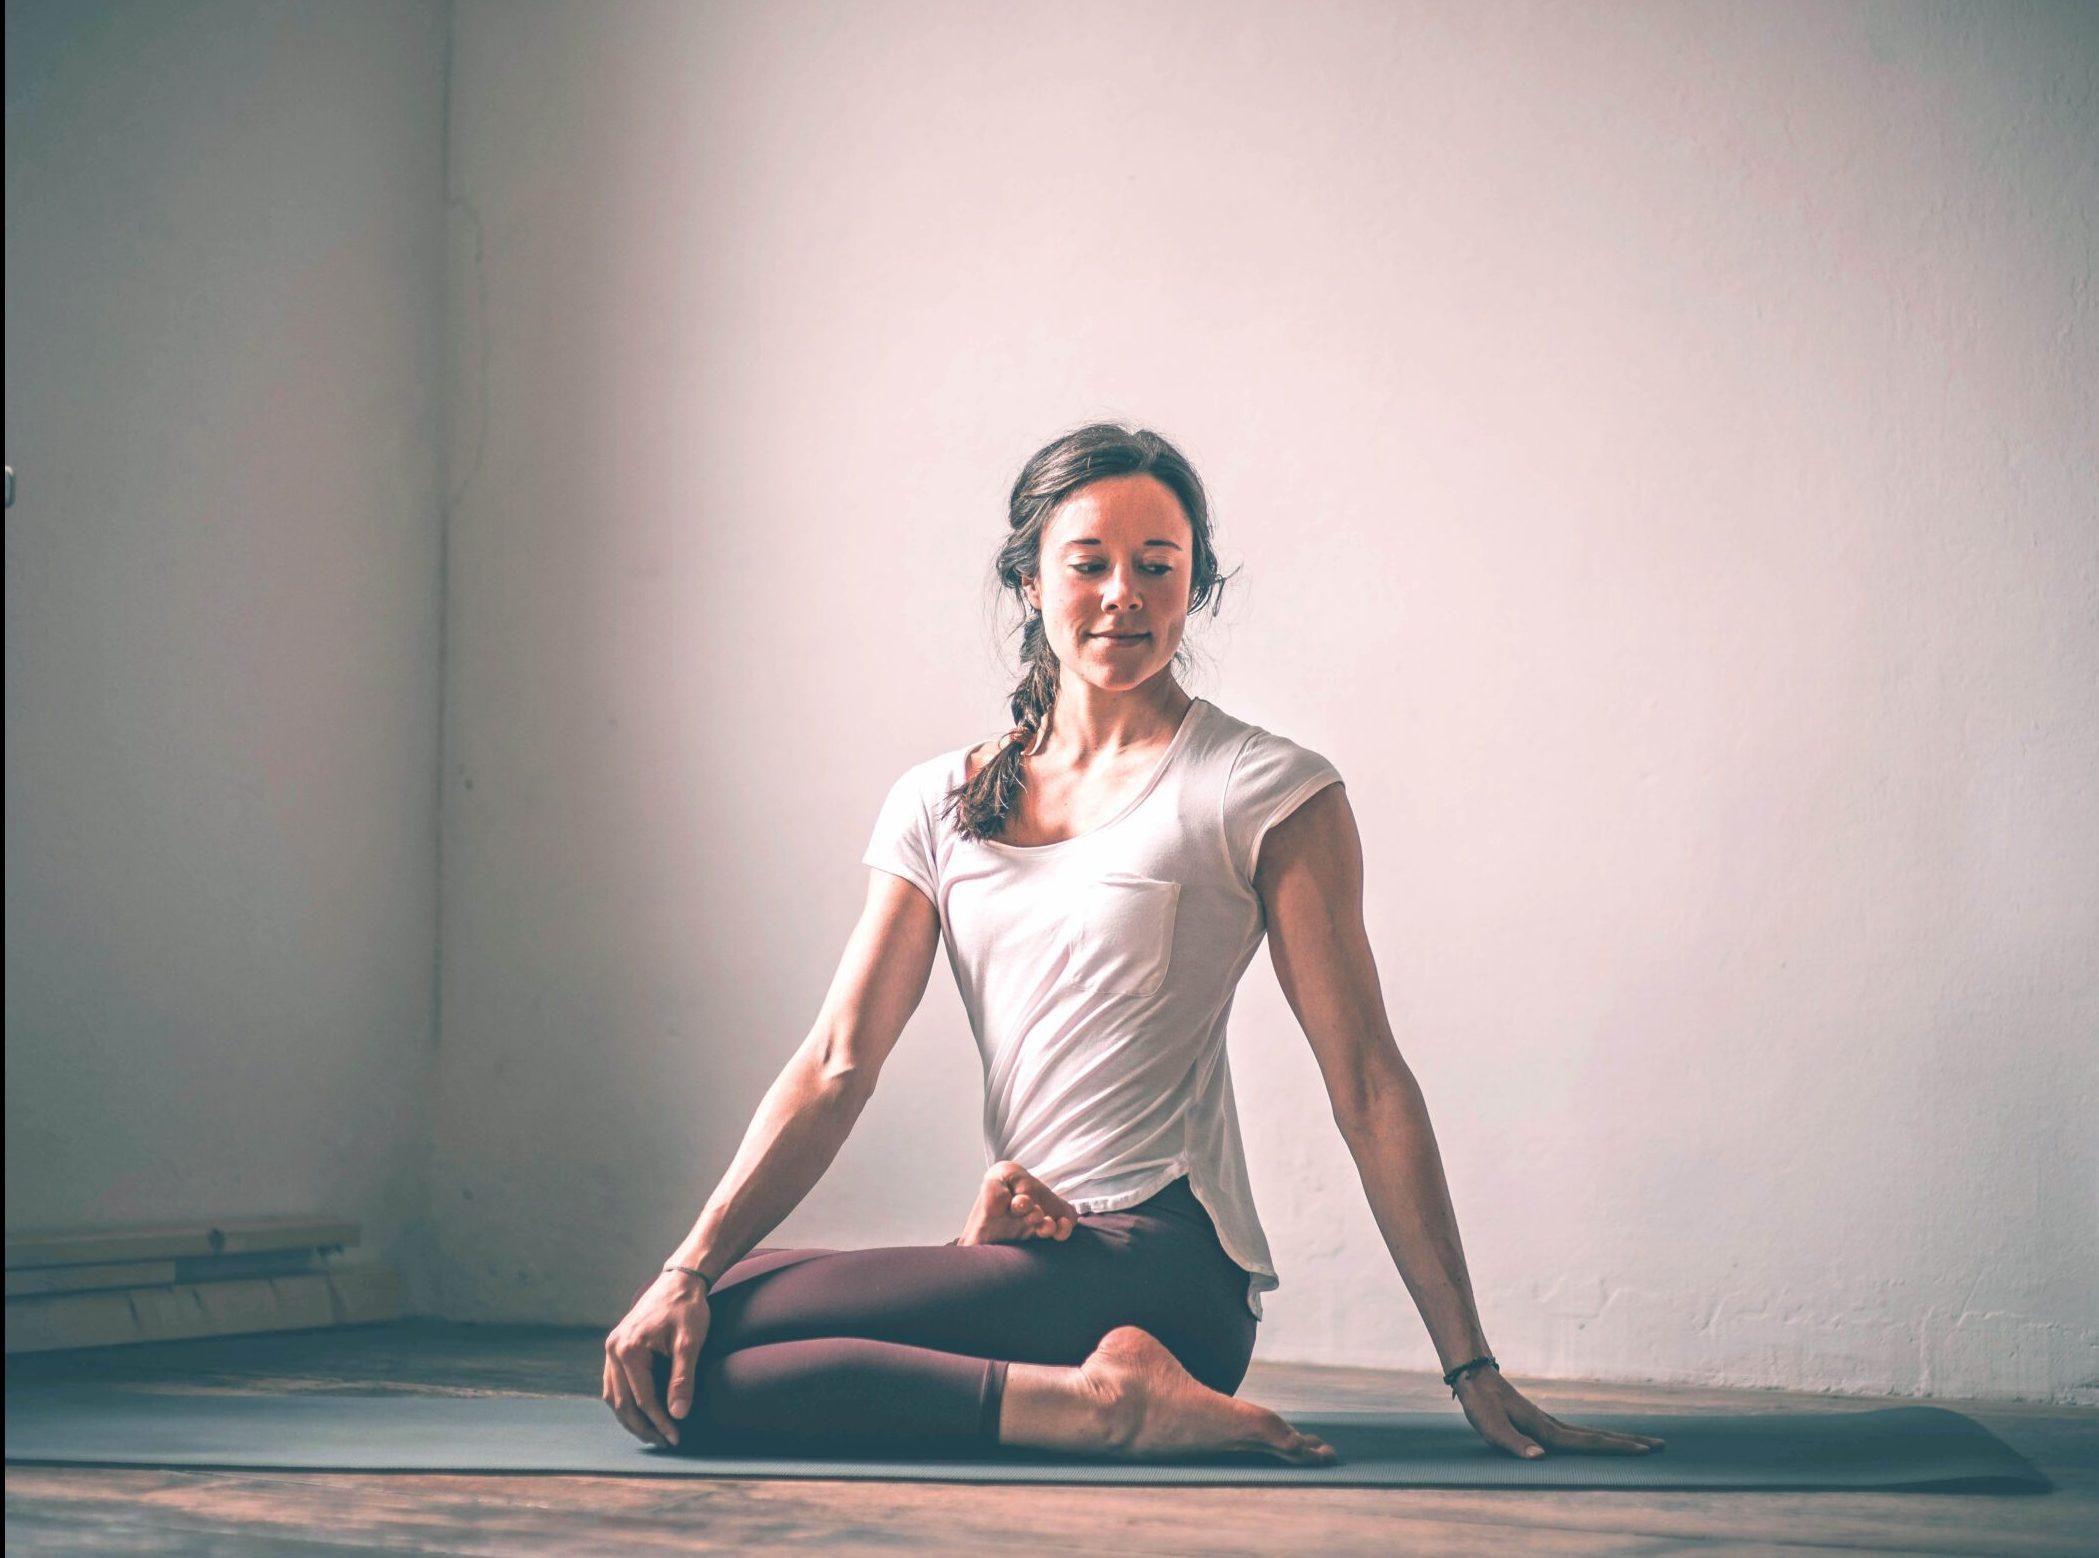 Anusara Yoga CB2 scaled 1 e1614879370692 - LP - Morgenroutine In den Tag hineinleben